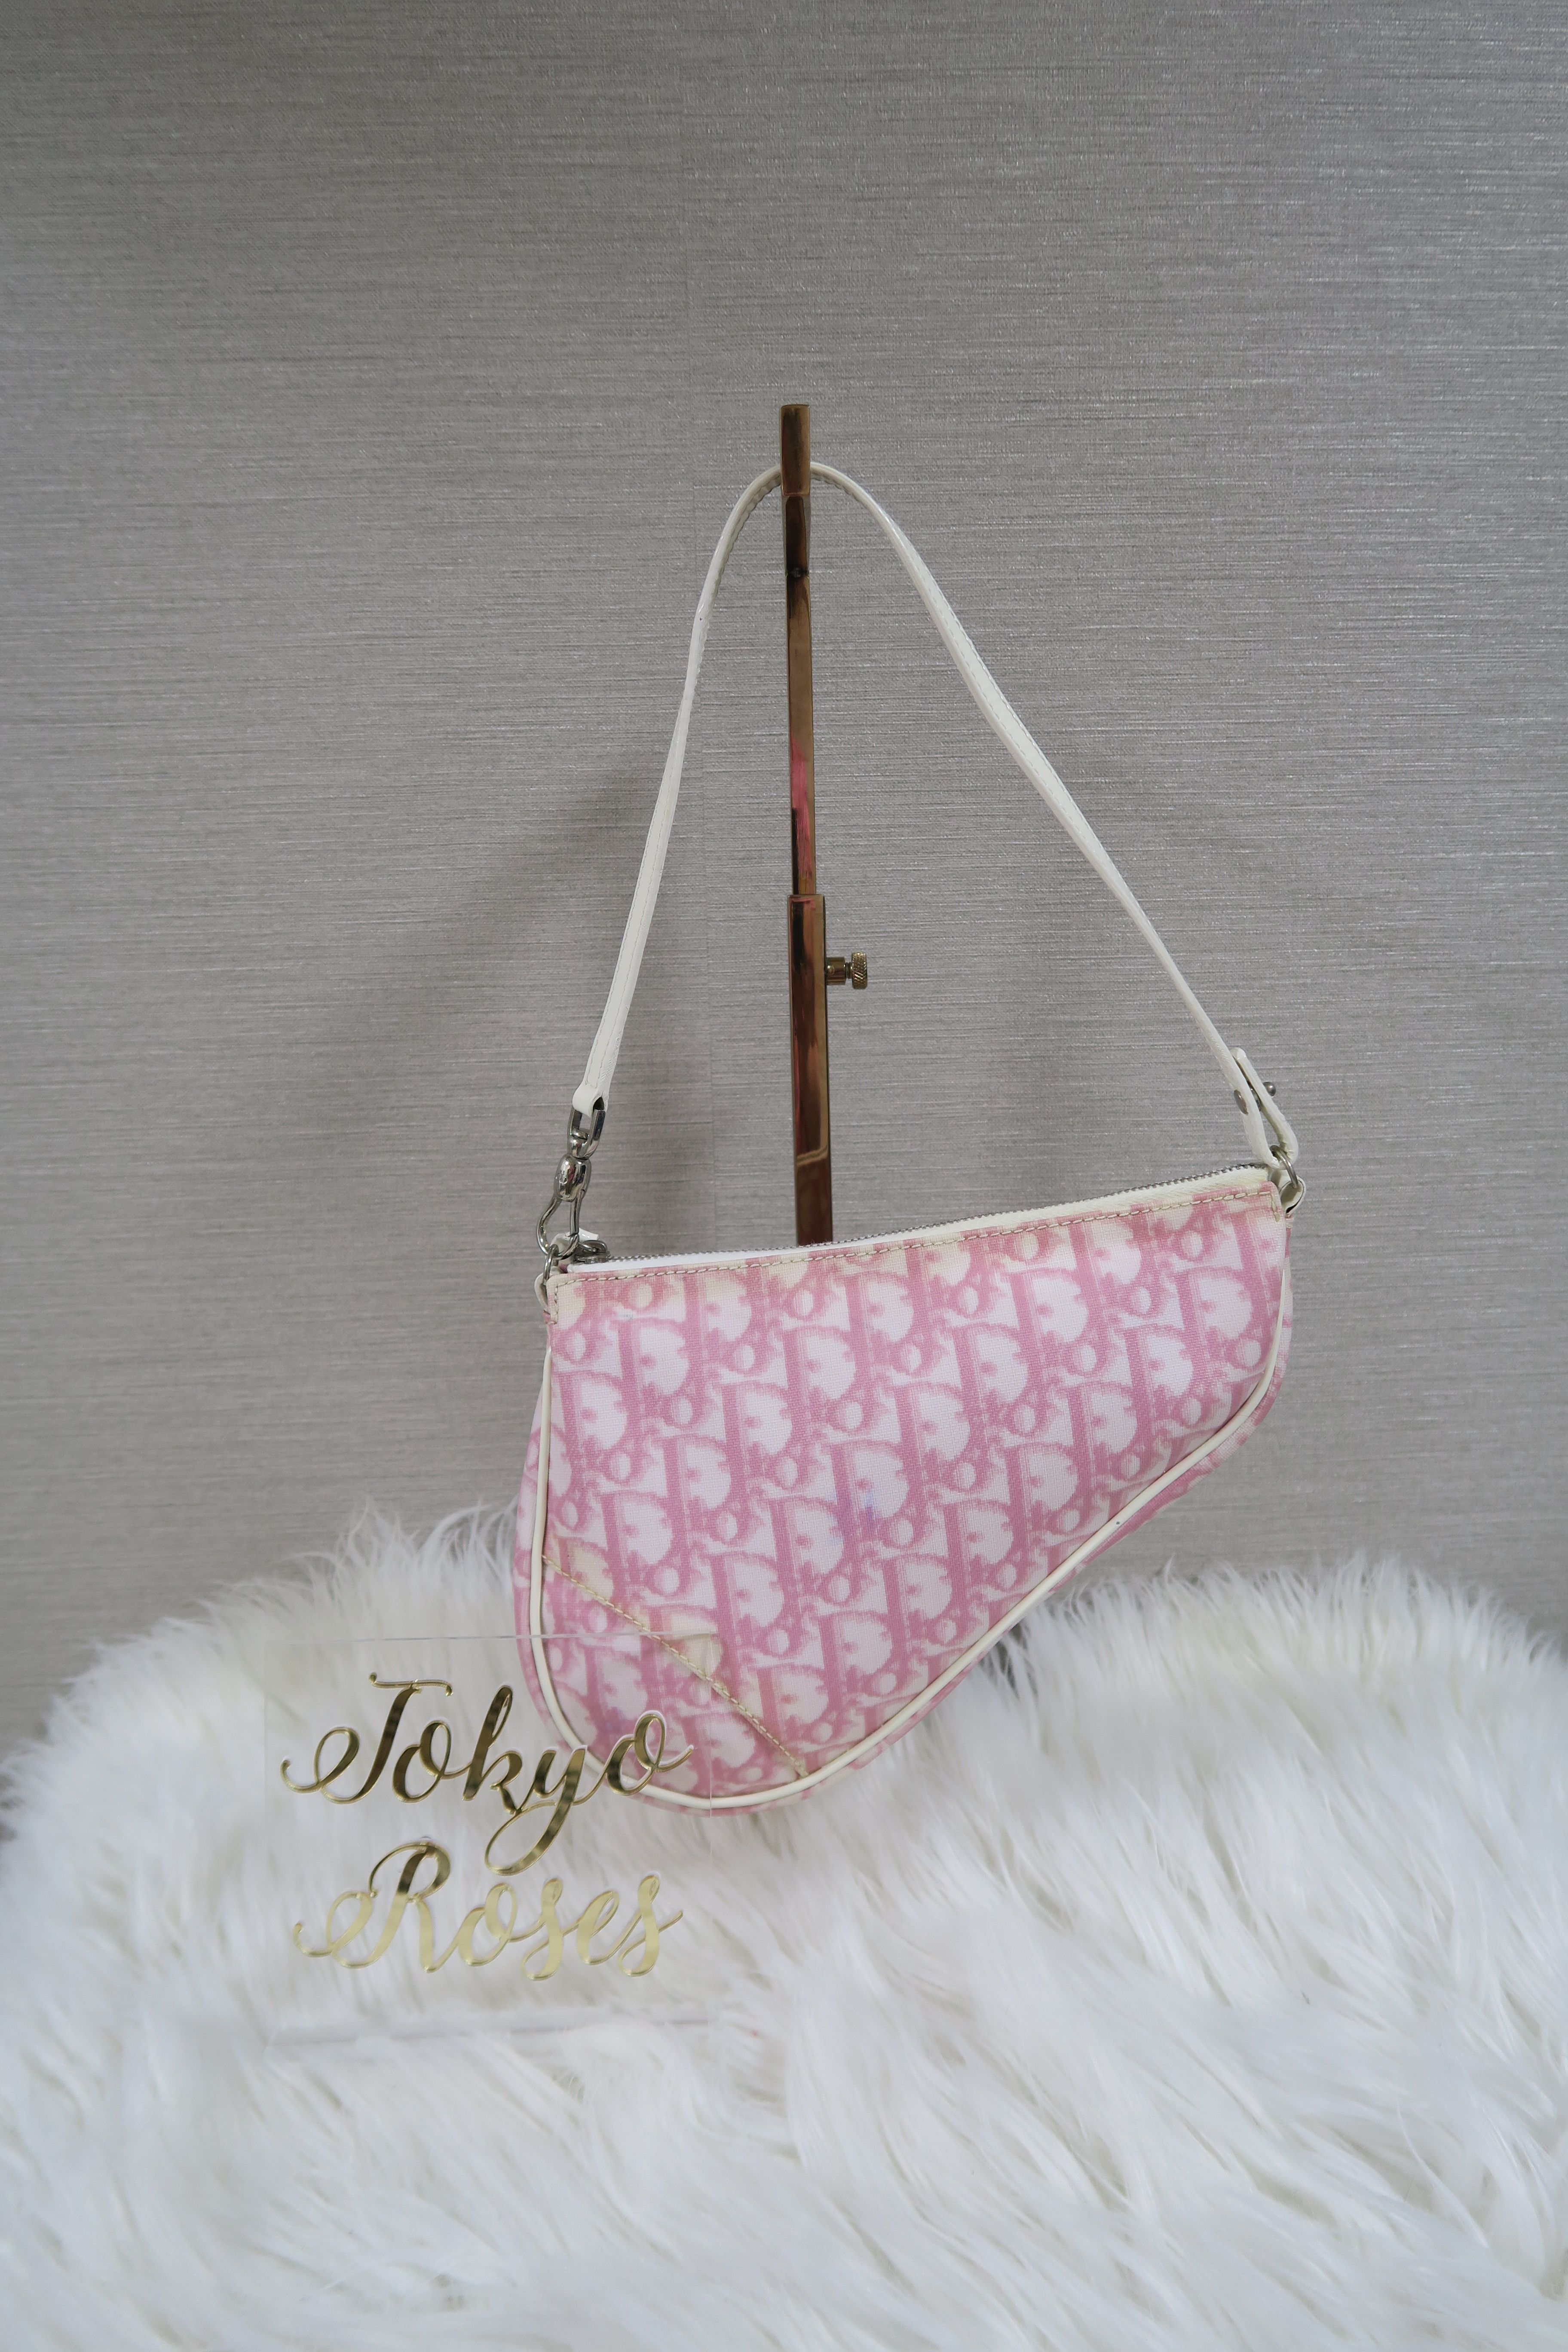 ca71a2361dc4e Christian Dior Trotter Monogram Print Saddle Bag Pink   White 1 ...